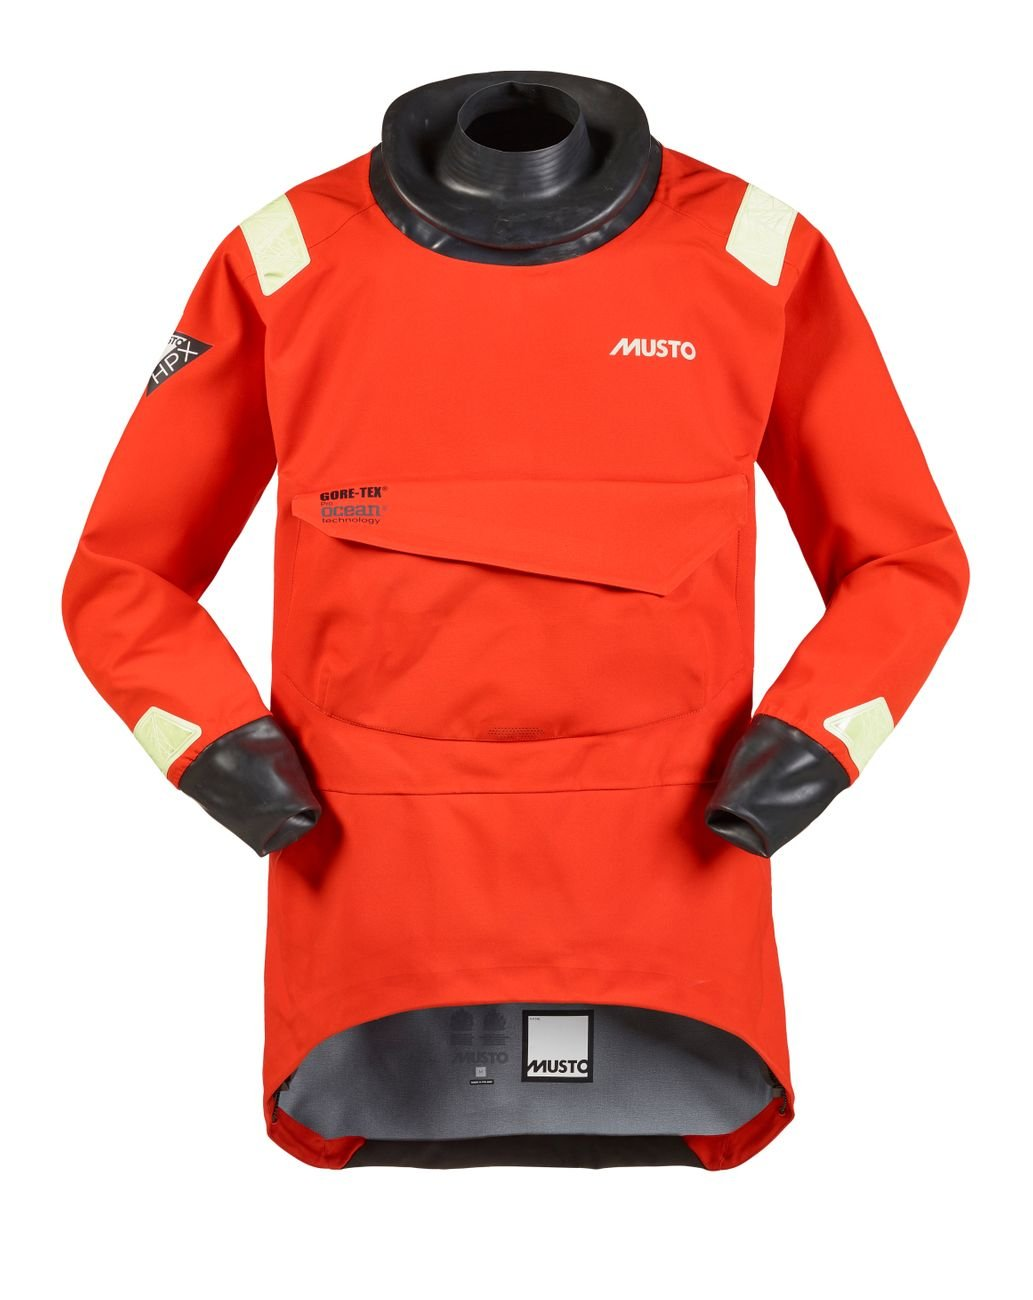 Musto 2017 HPX Pro Series Dry Dry Dry Smock FIRE Orange SH1710 B01D4W54ME Jacken Freizeit 7c2cde